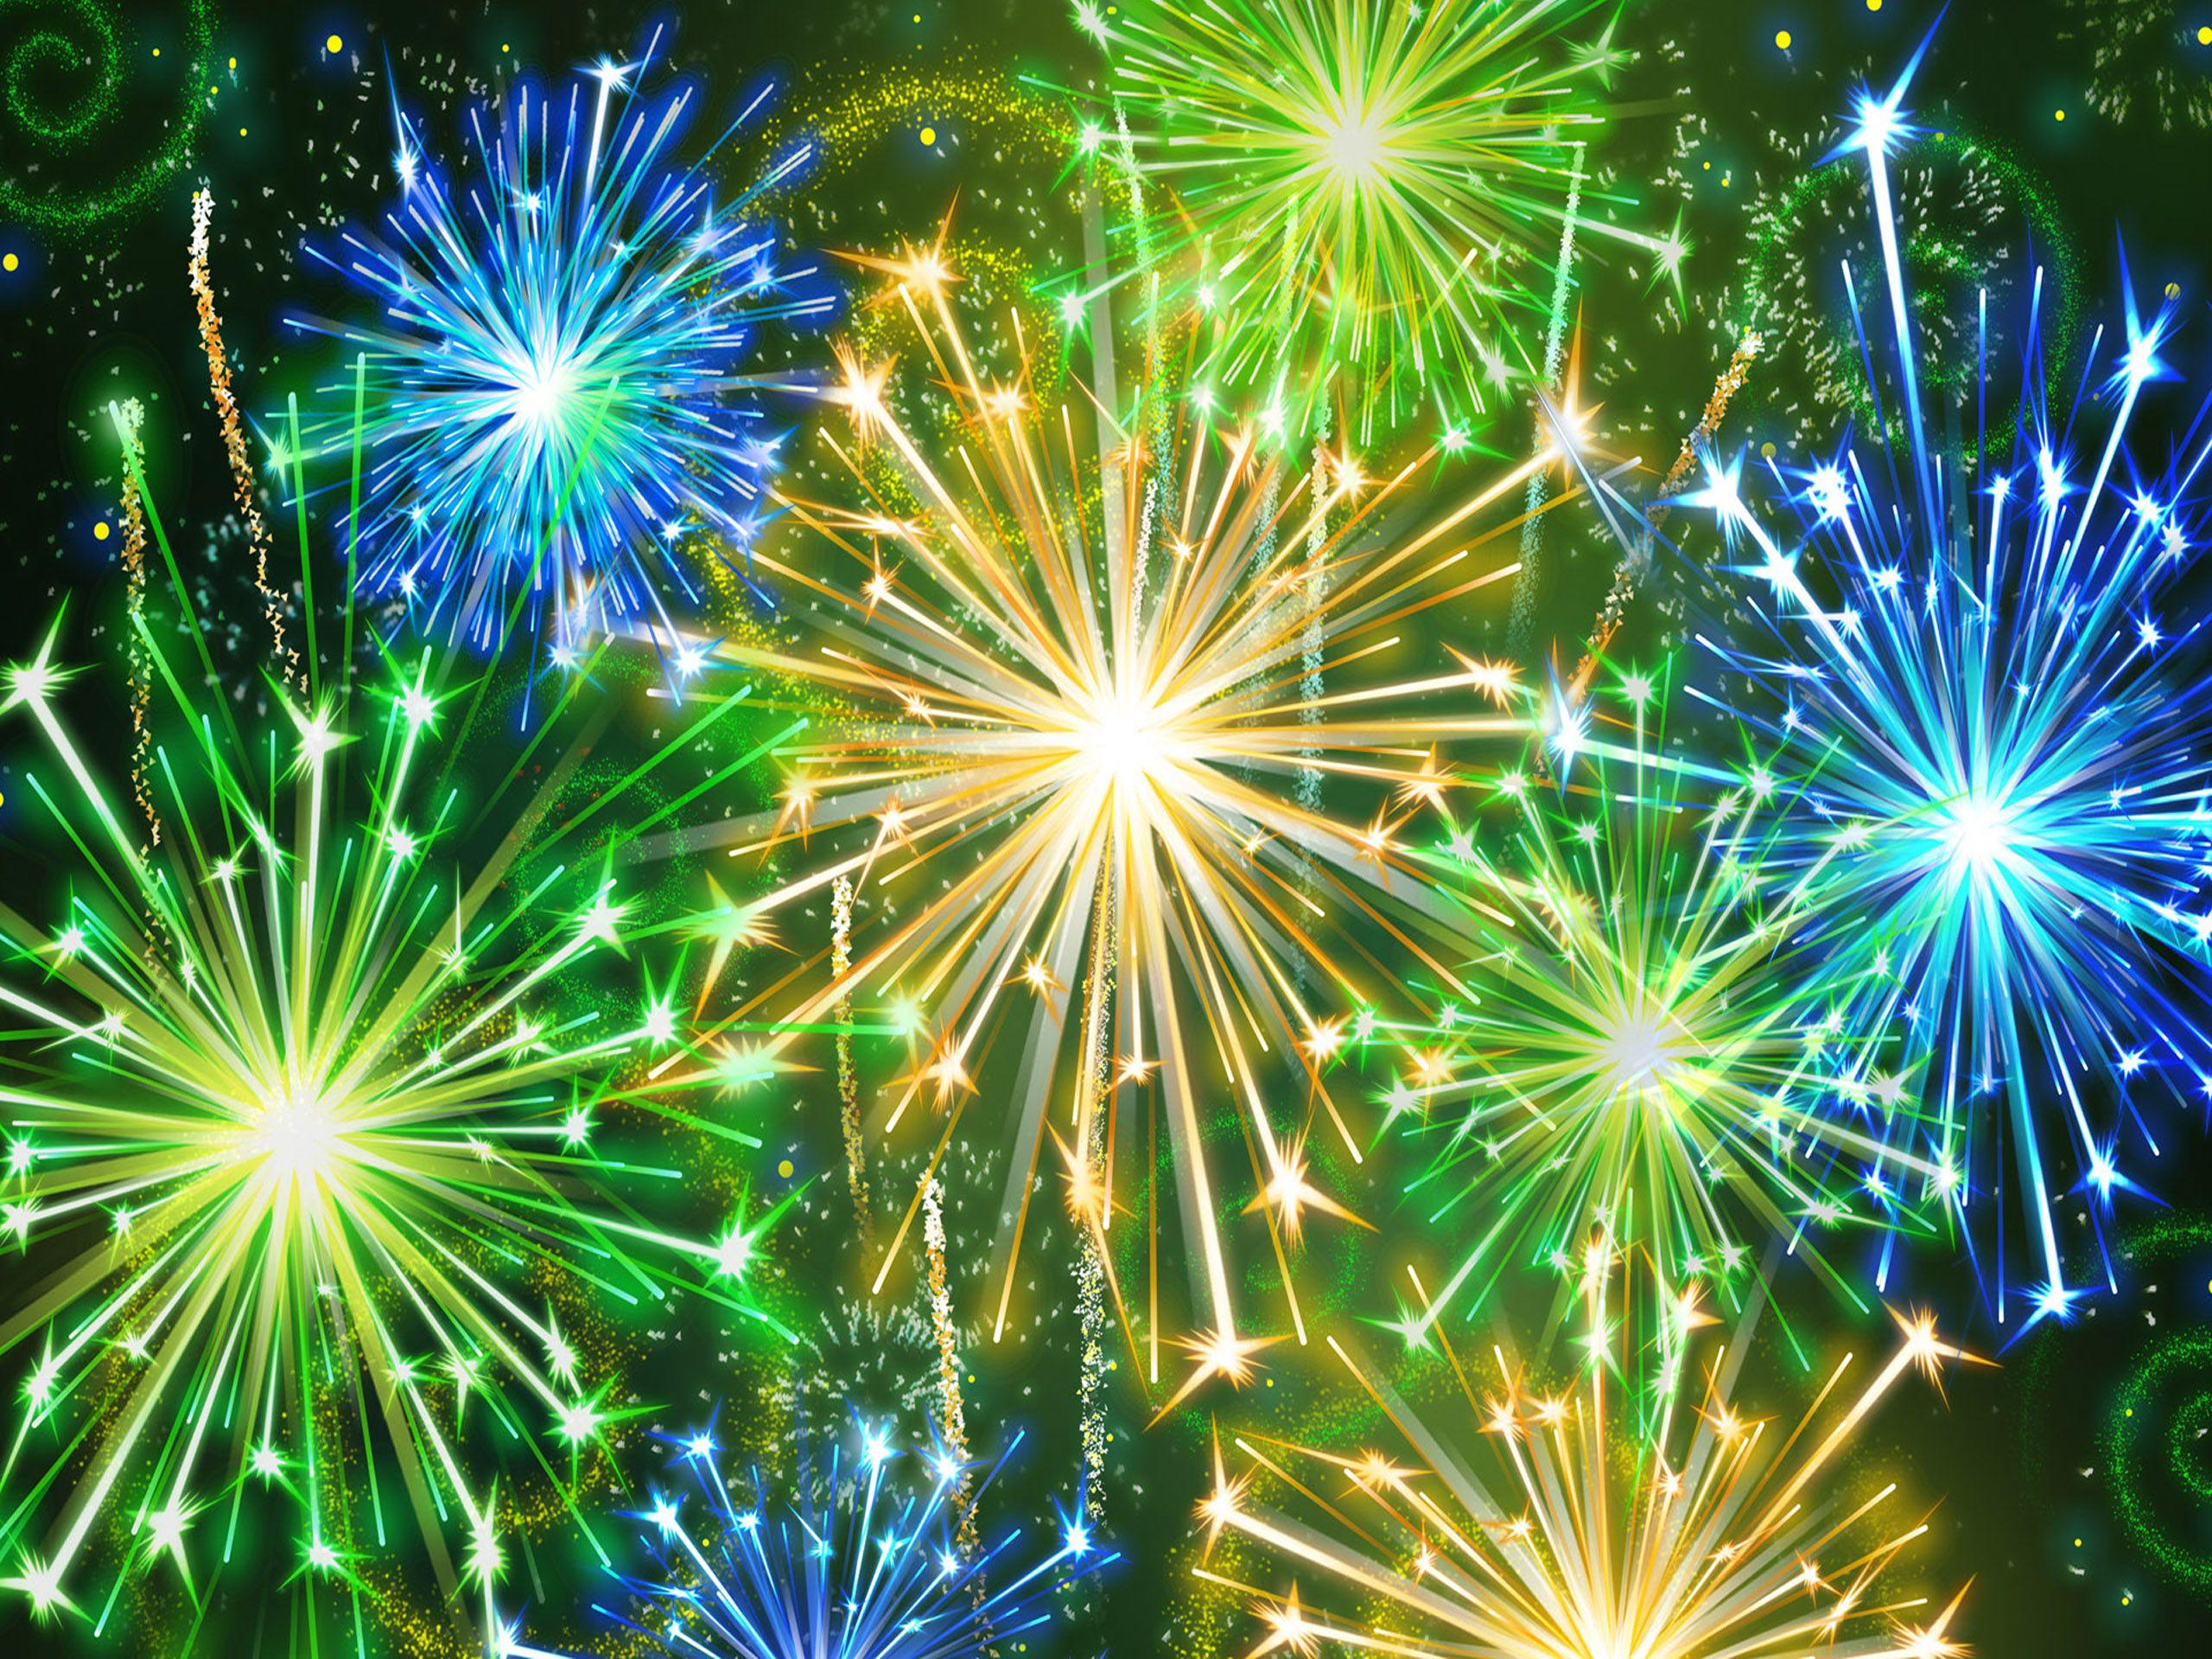 Fireworks | New year fireworks, New years eve fireworks ...